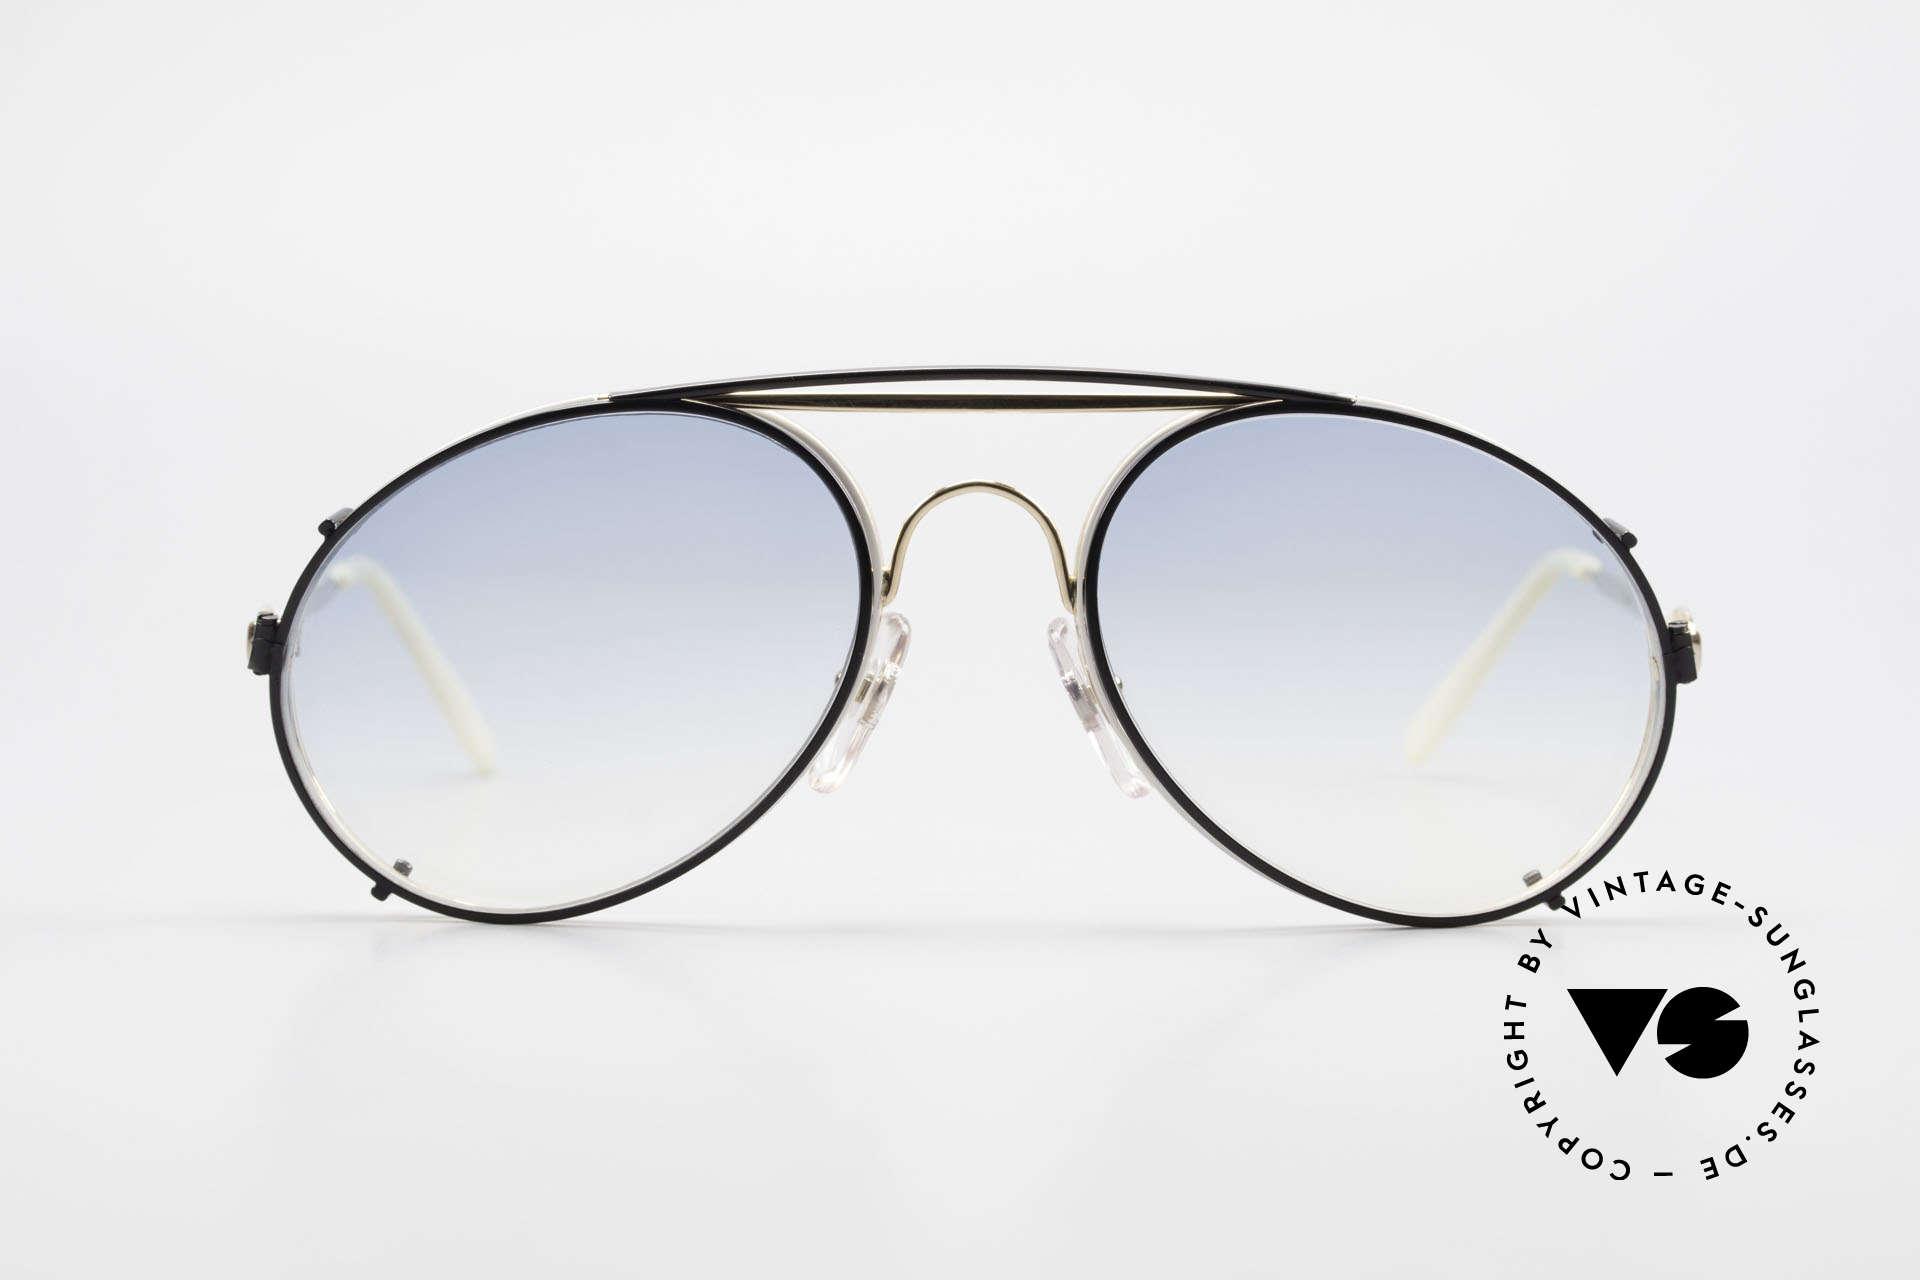 Bugatti 65987 Vintage Frame With Clip On, legendary vintage BUGATTI 'tear drop' design, Made for Men